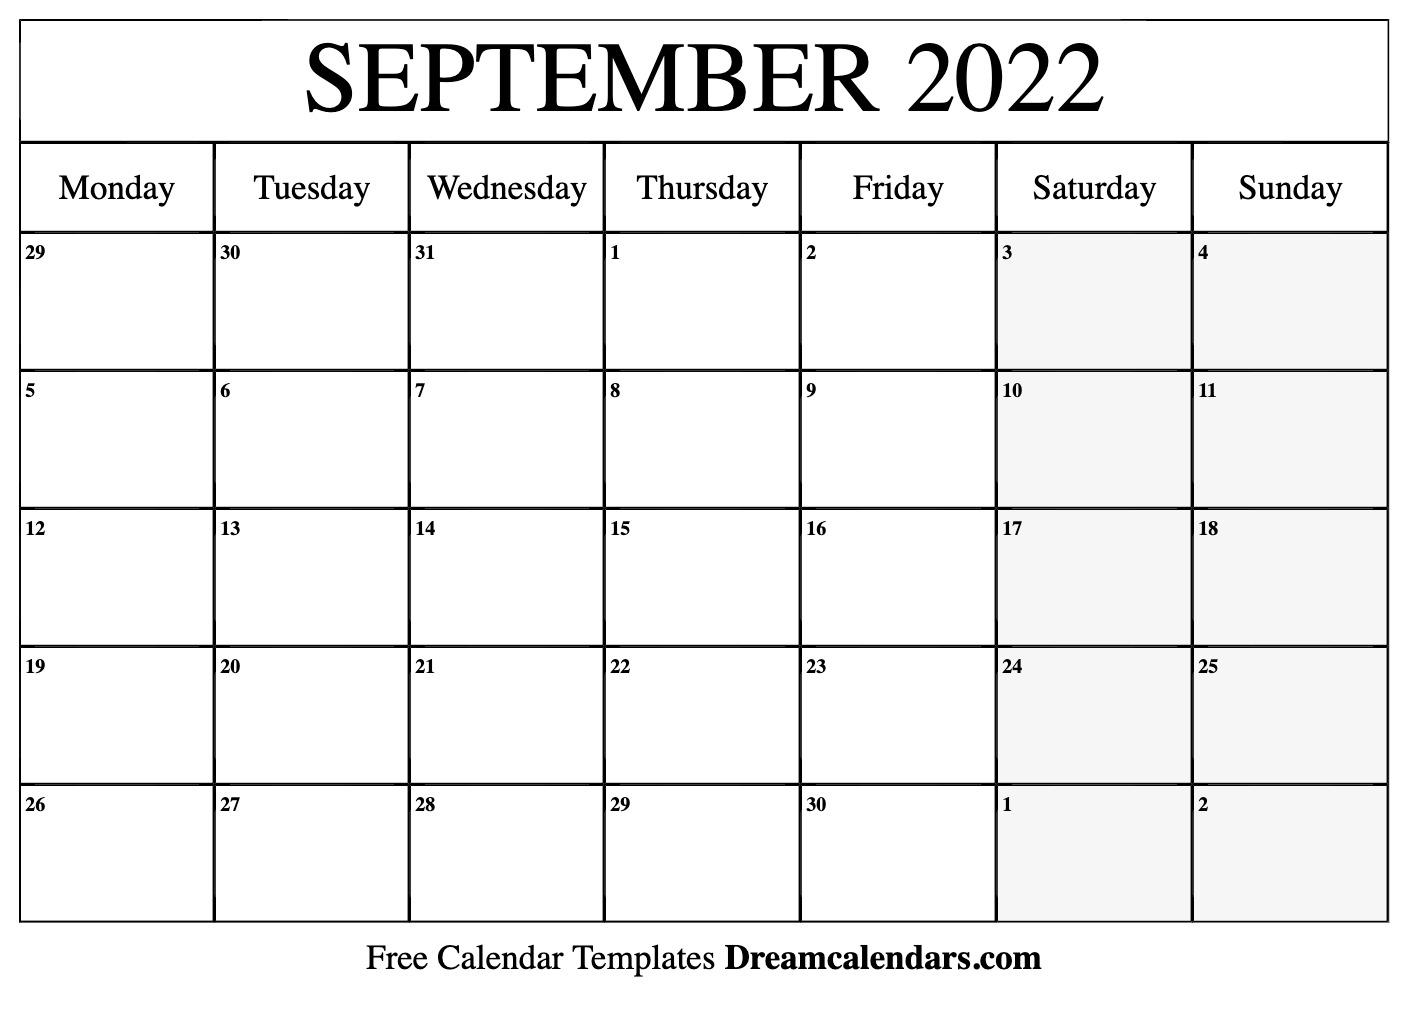 Monthly Calendar September 2022.September 2022 Calendar Free Blank Printable Templates